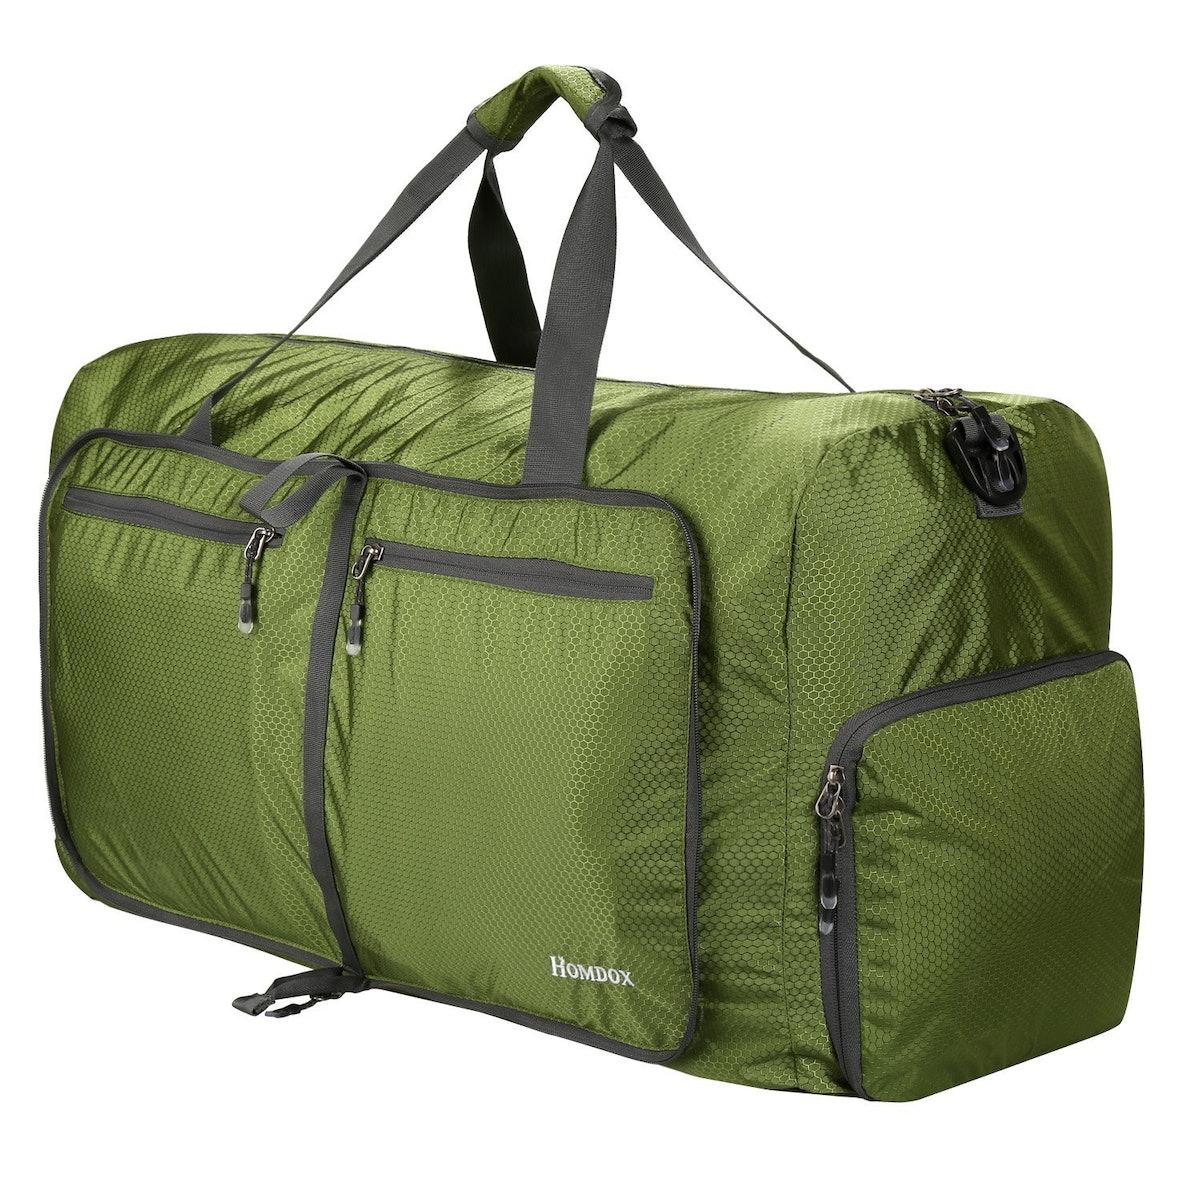 Homdox Foldable Duffle Bag